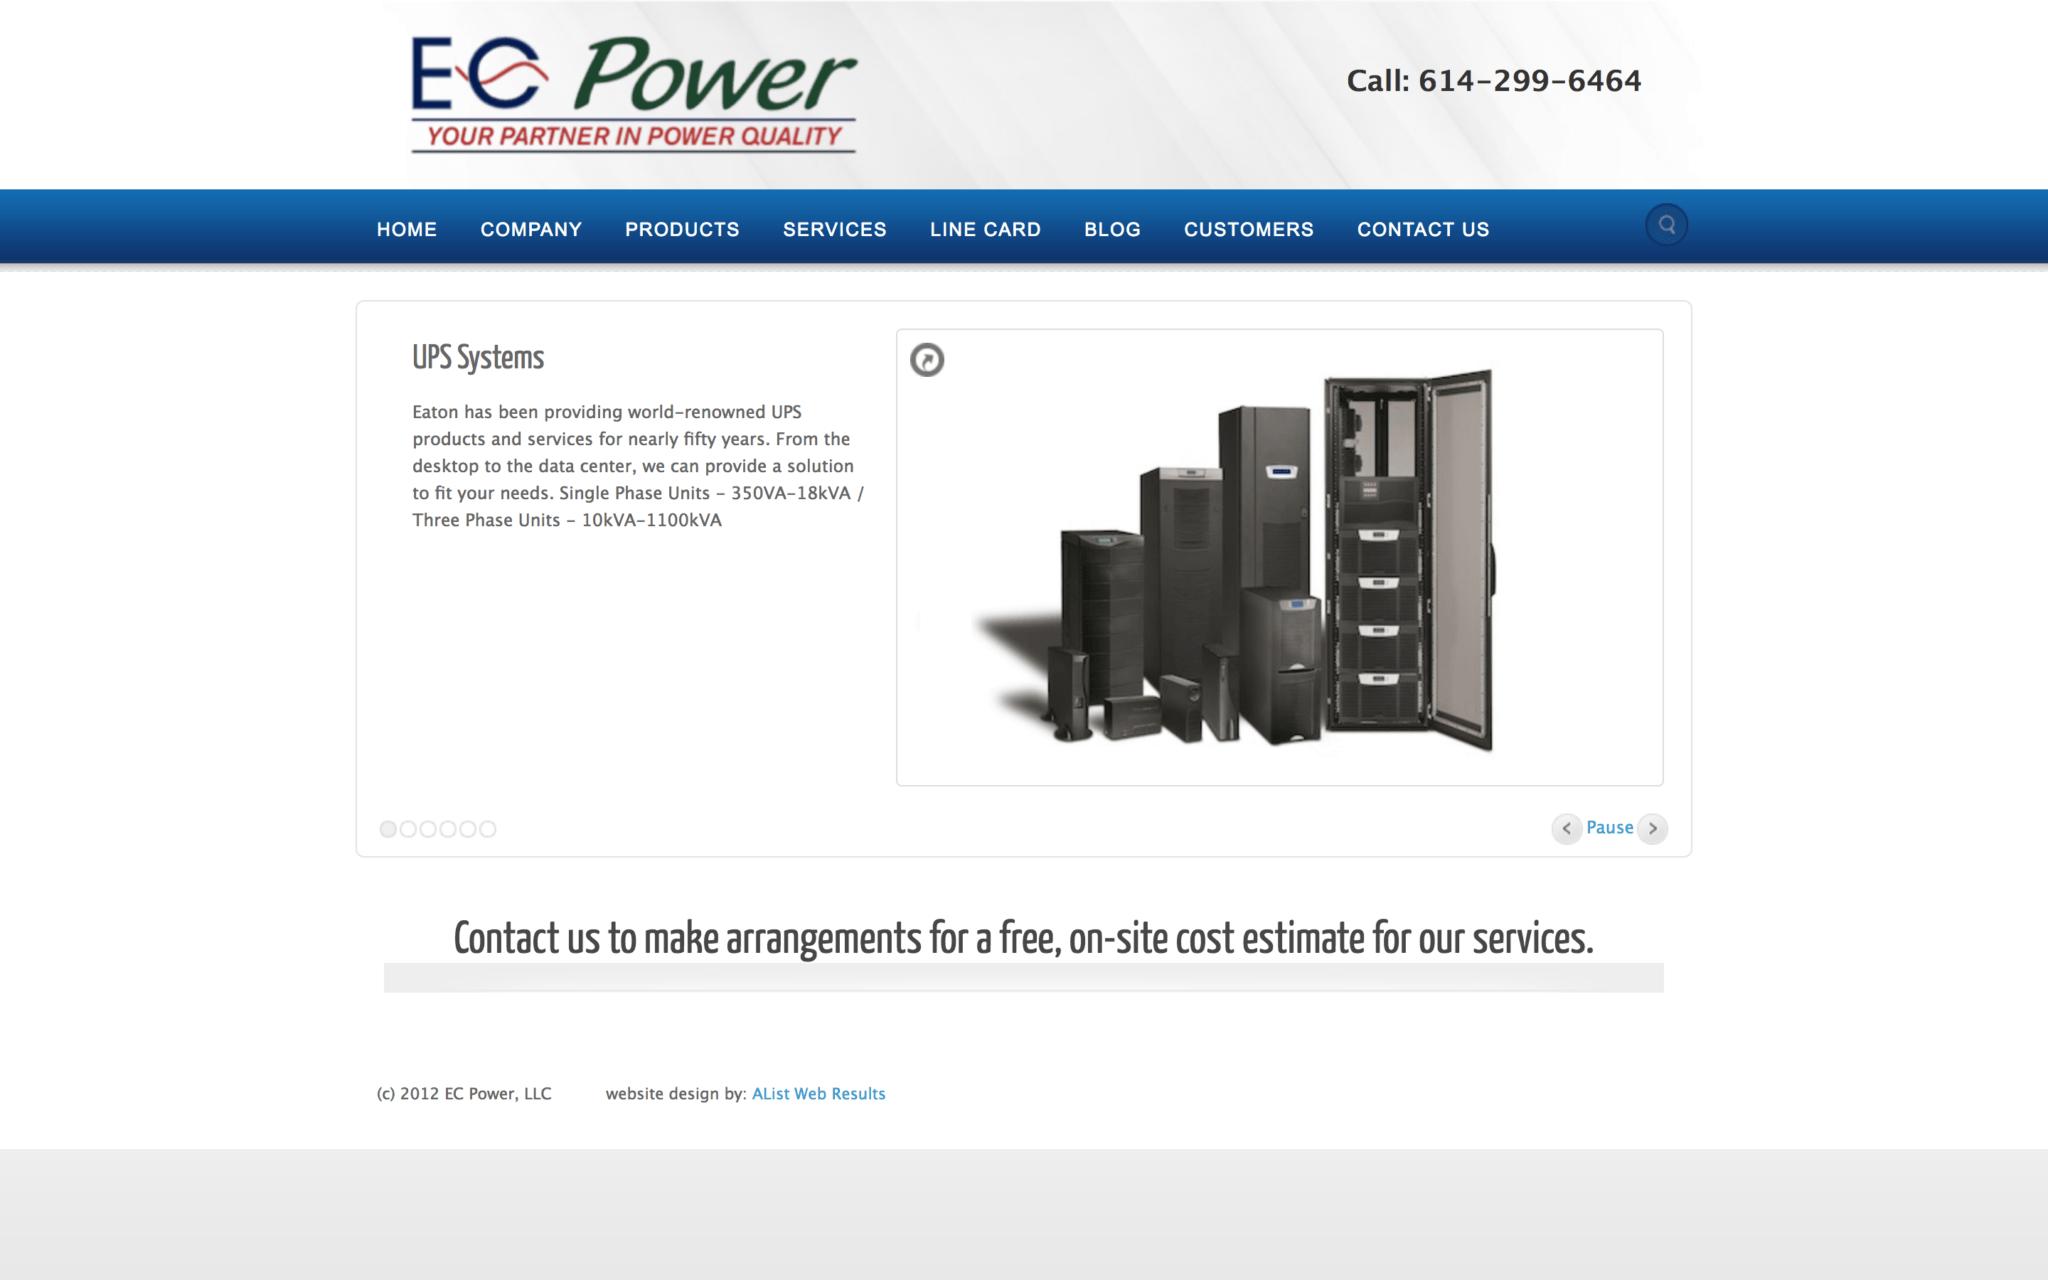 Screenshot of the original EC Power homepage